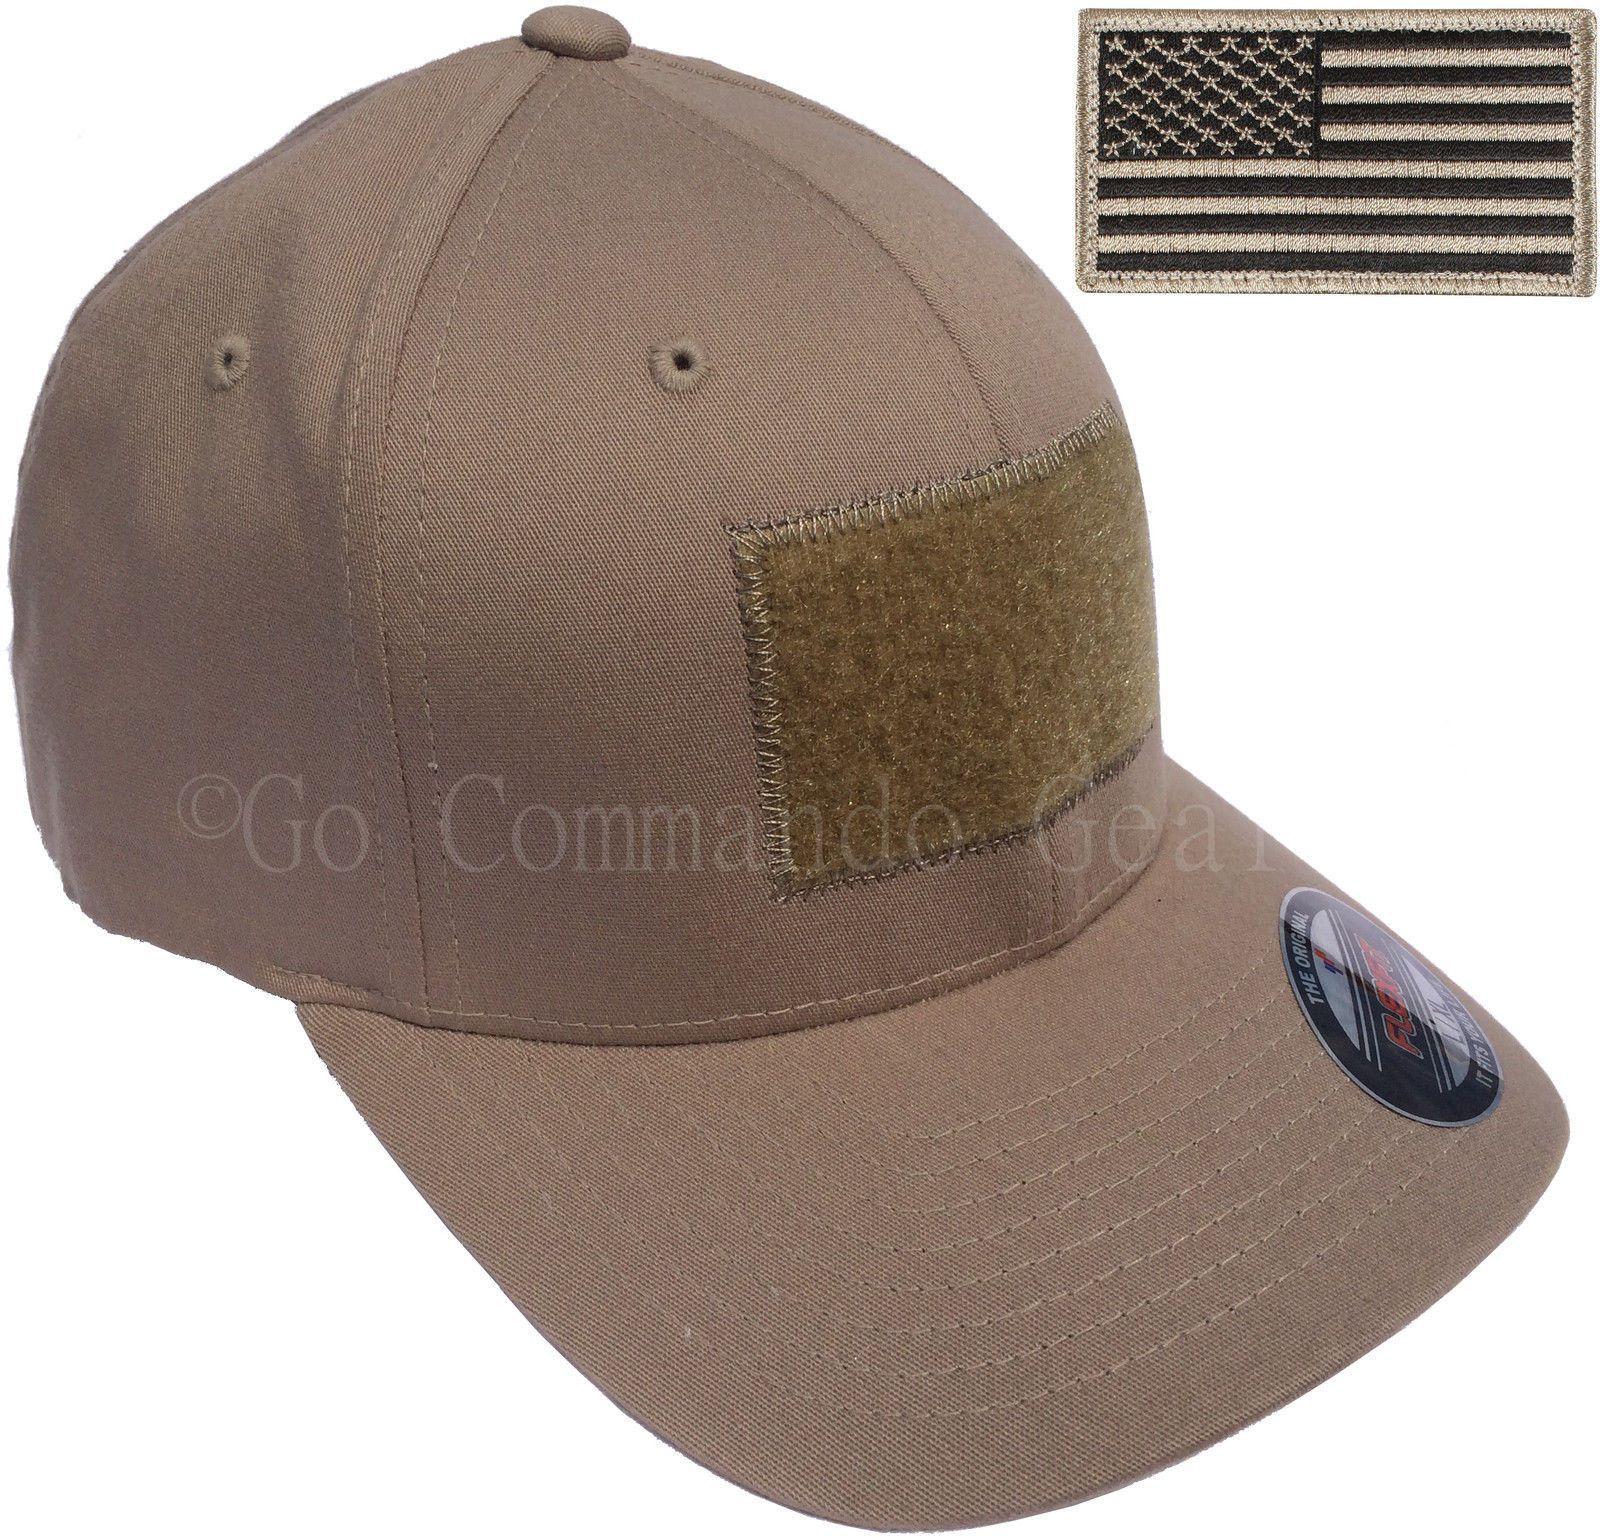 Mens fitted 98 cotton flexfit mid profile tactical cap w